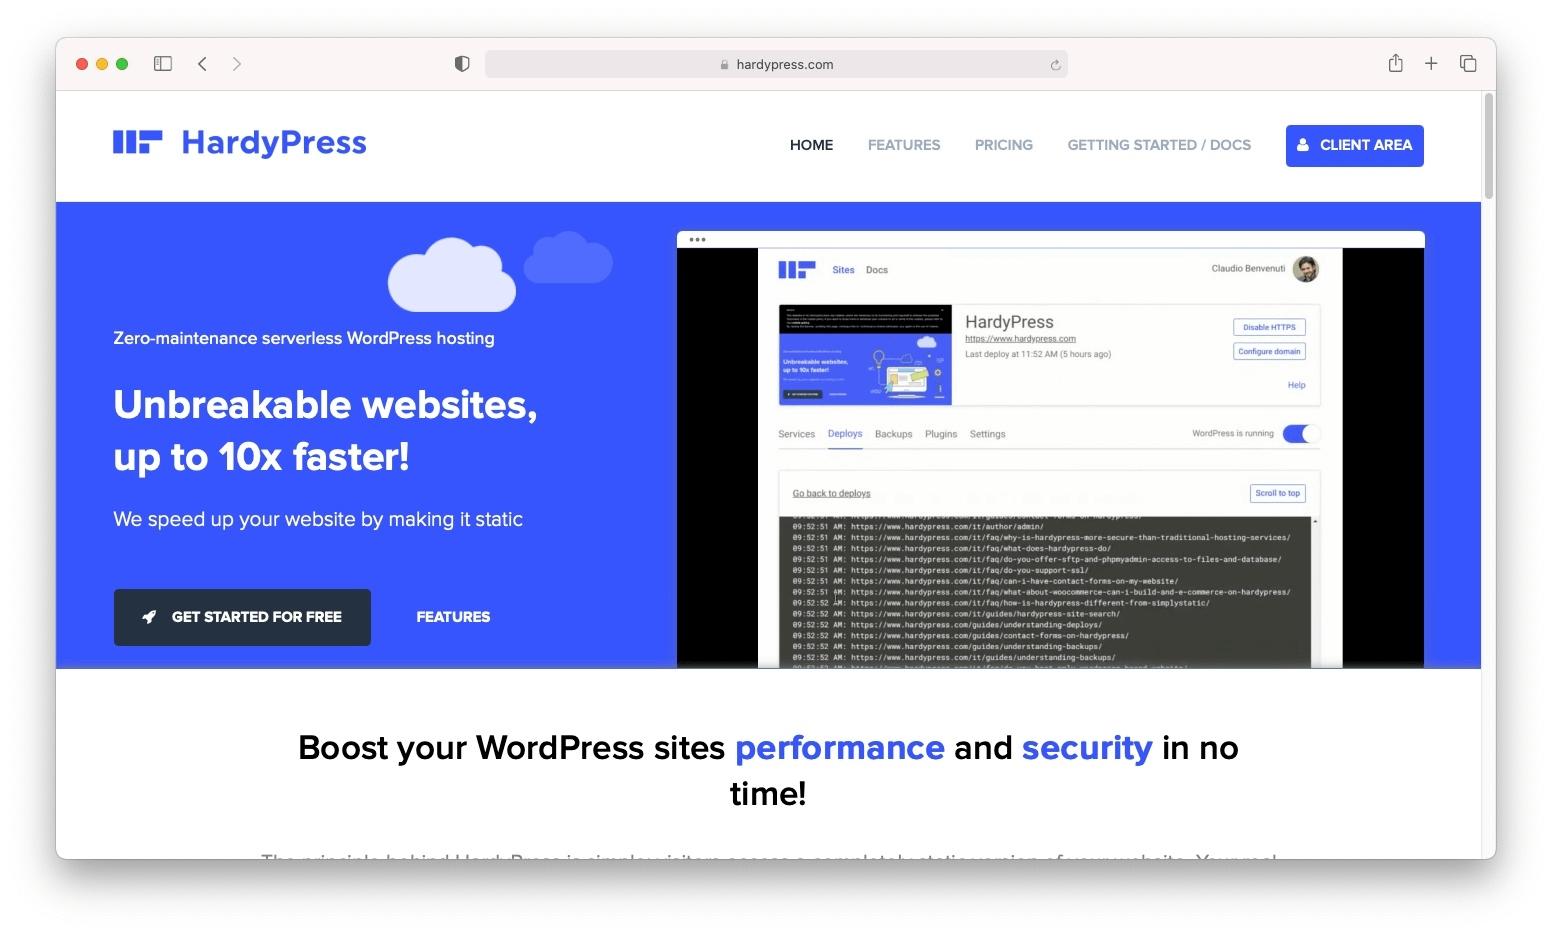 Hospedagem WordPress sem servidor HardyPress.